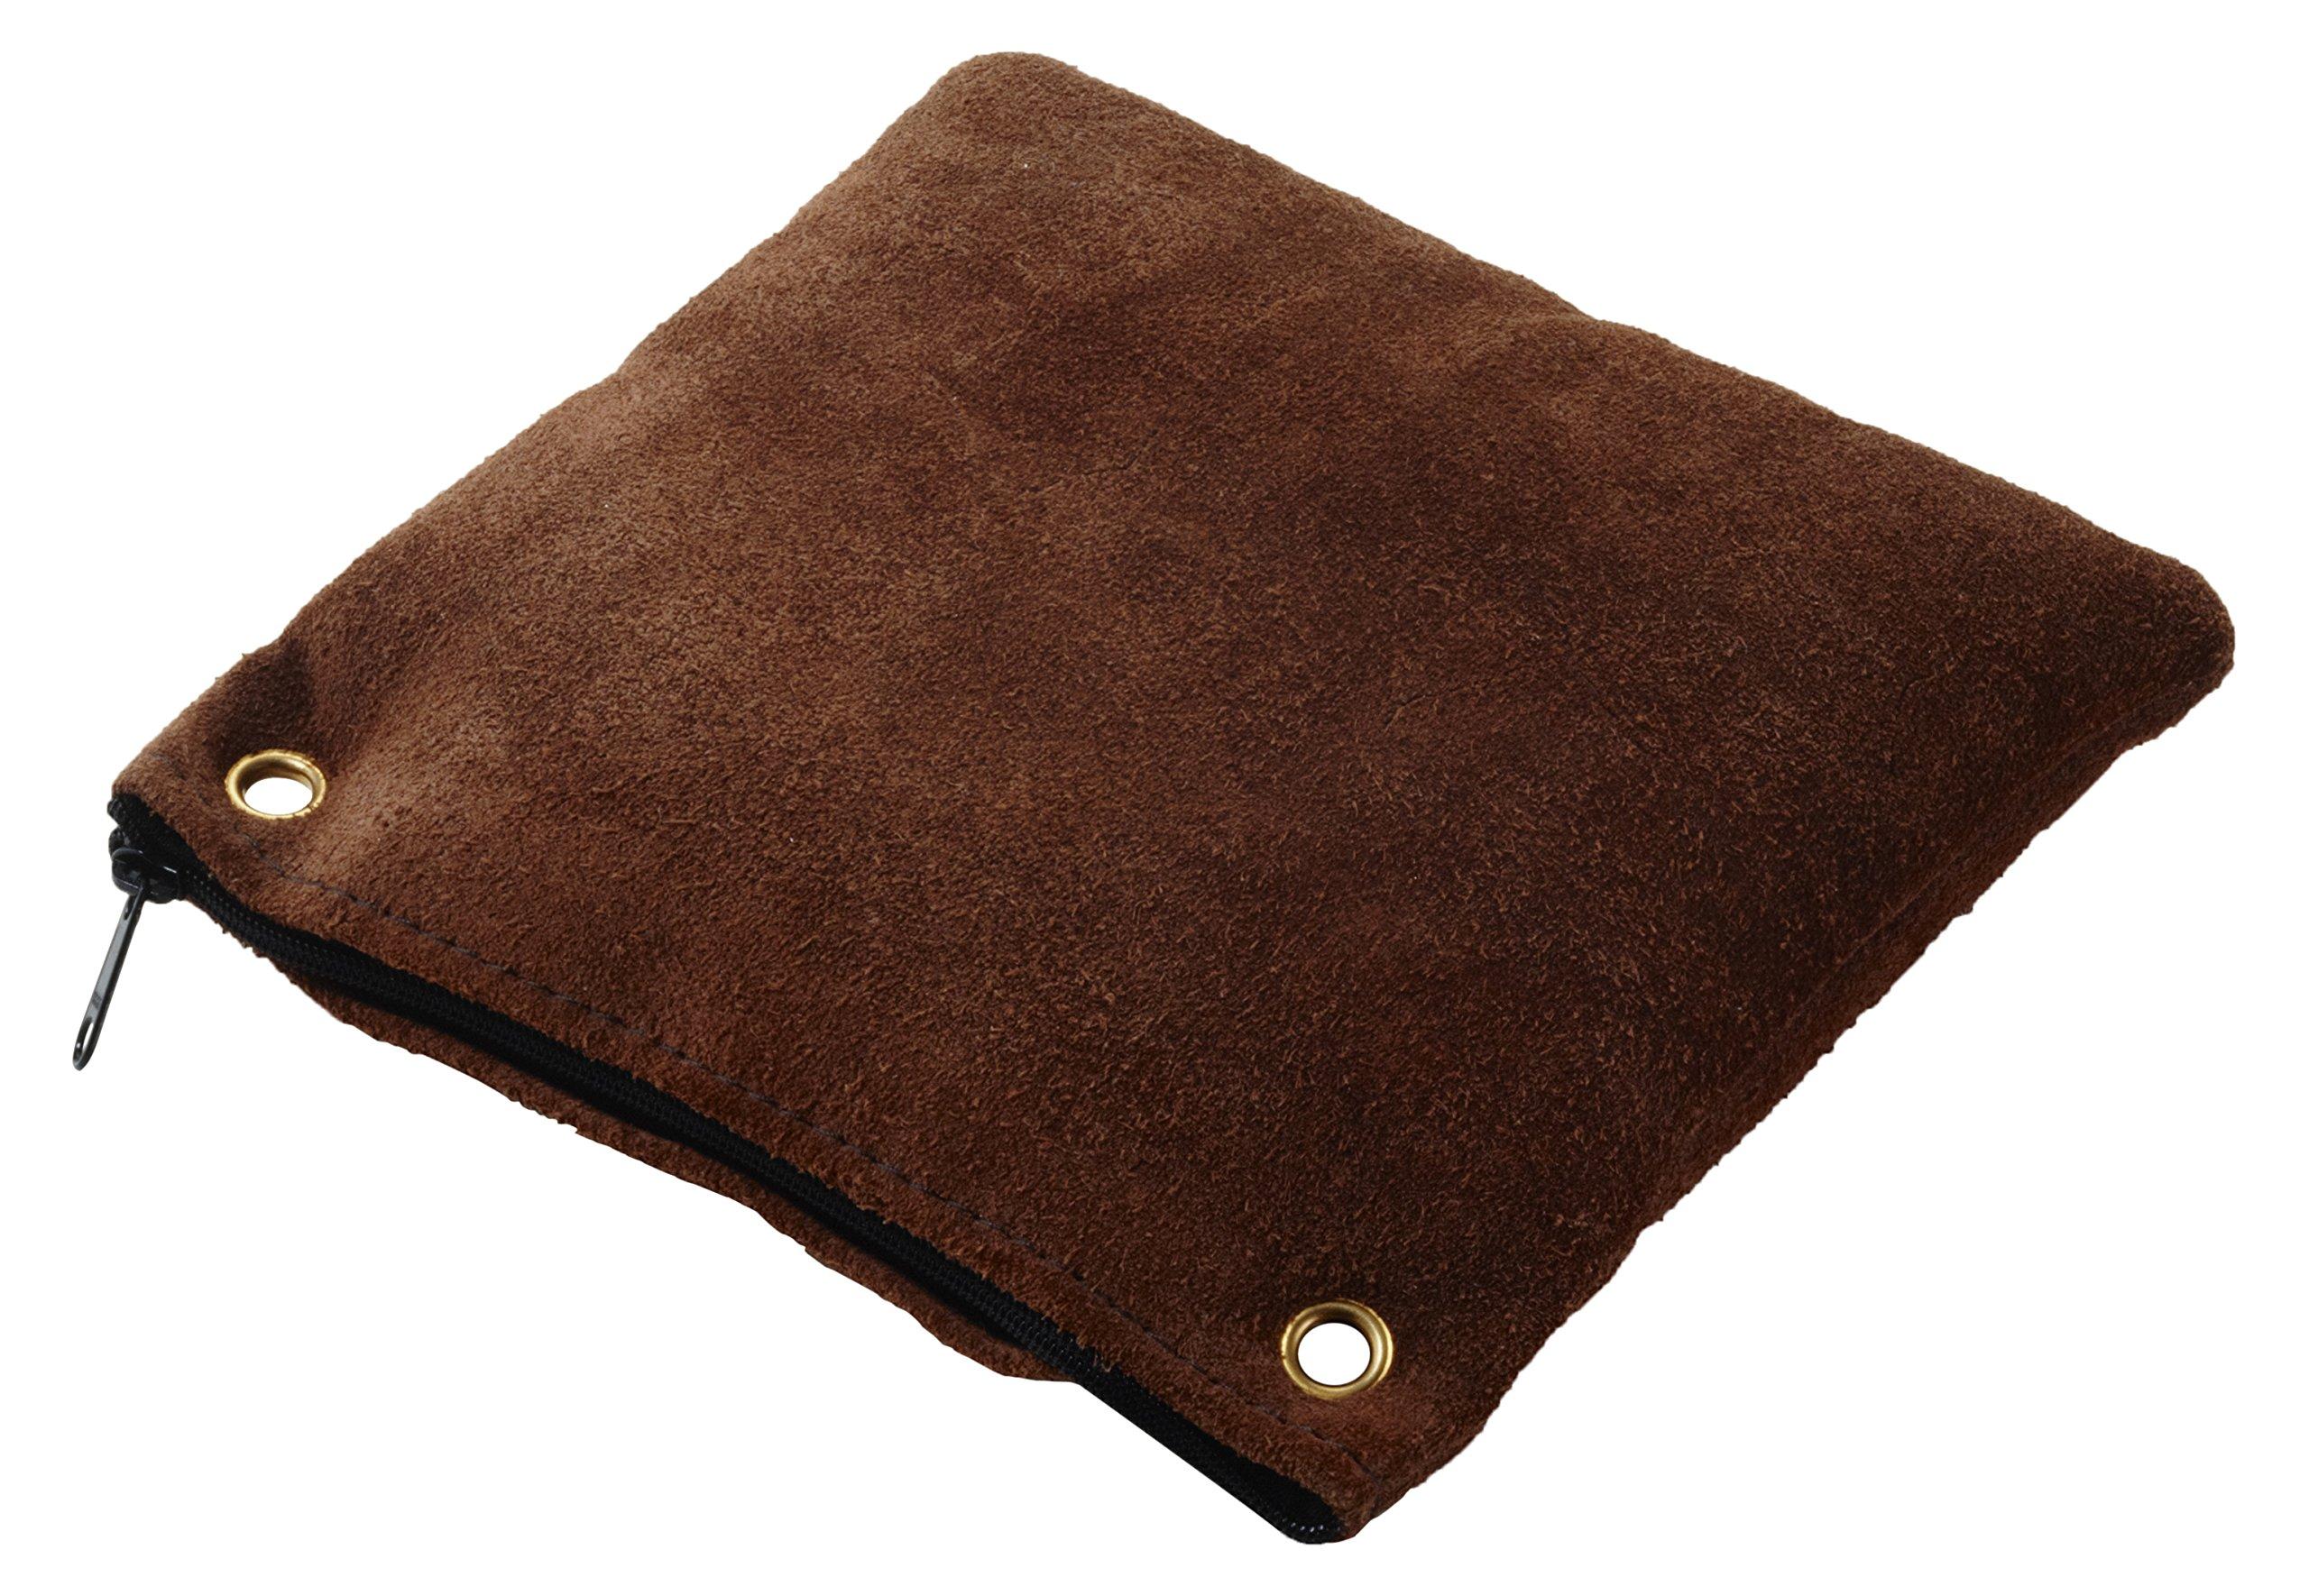 Novoflex 8x8'' Leather Bean Bag Lens Support (TELESACK)